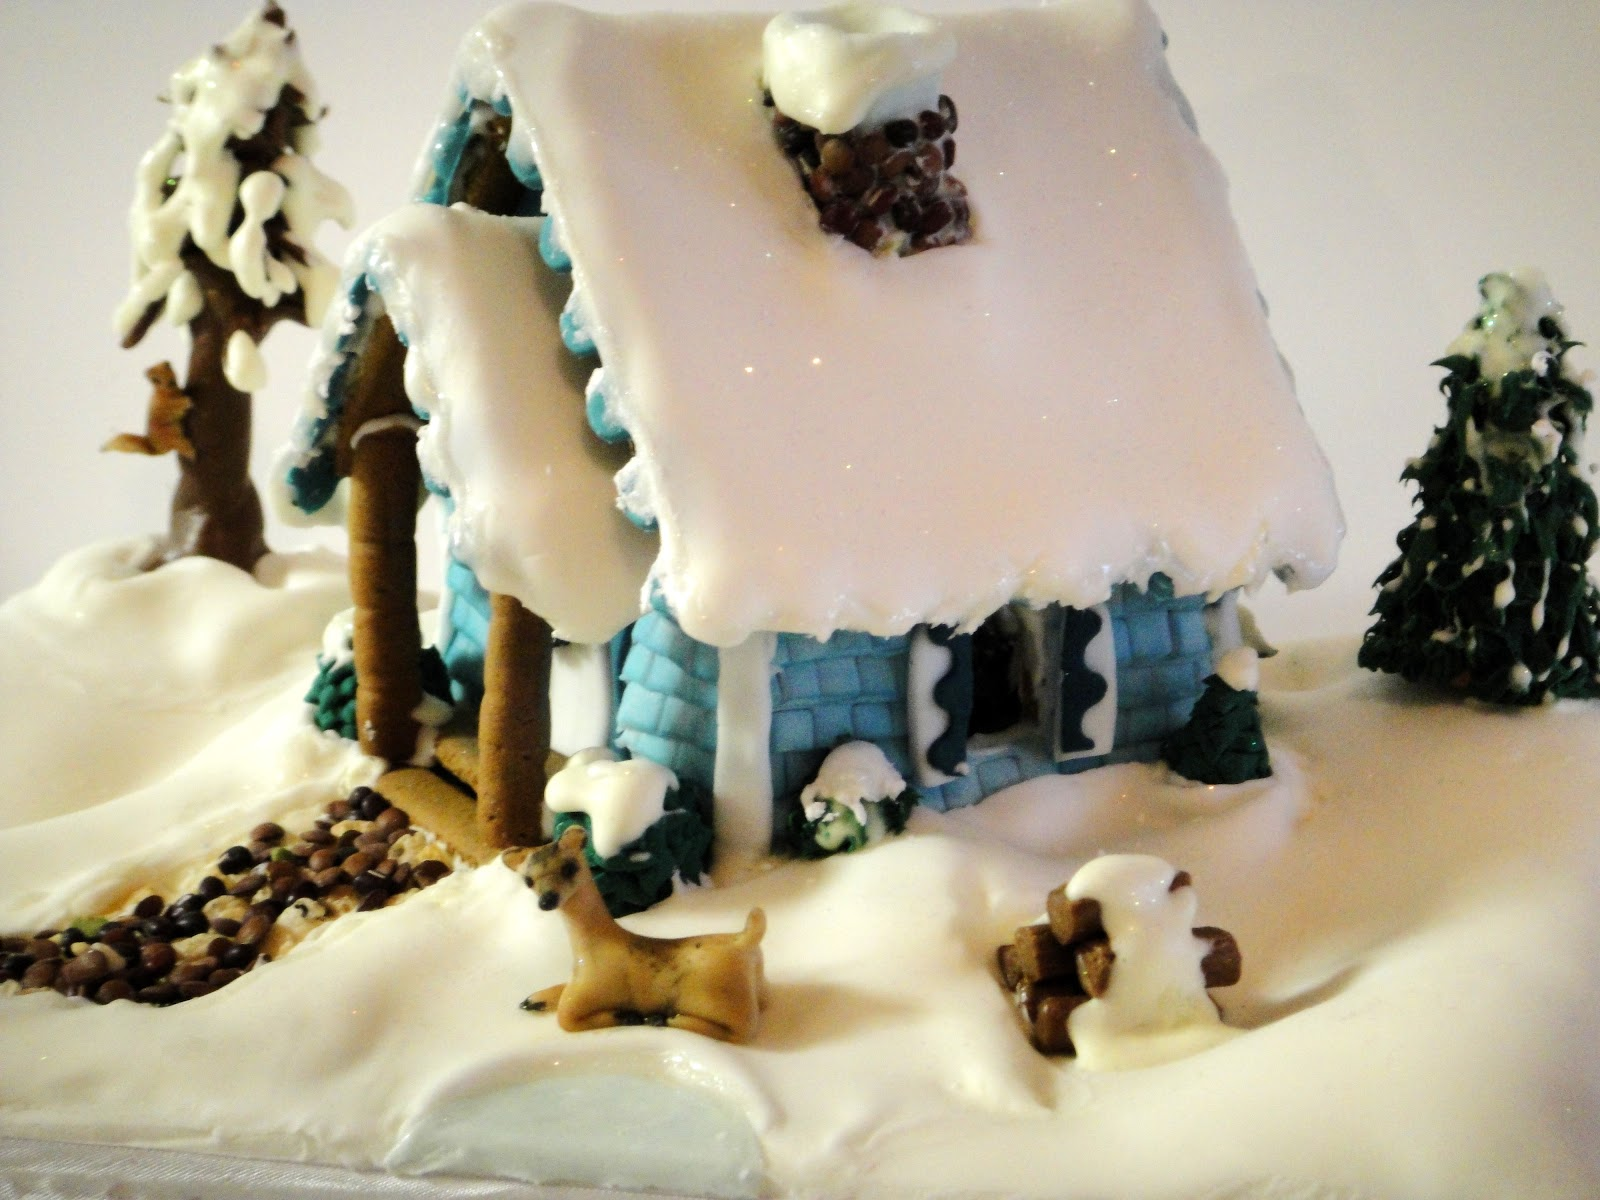 Sugar Teachers Cake Decorating And Sugar Art Tutorials